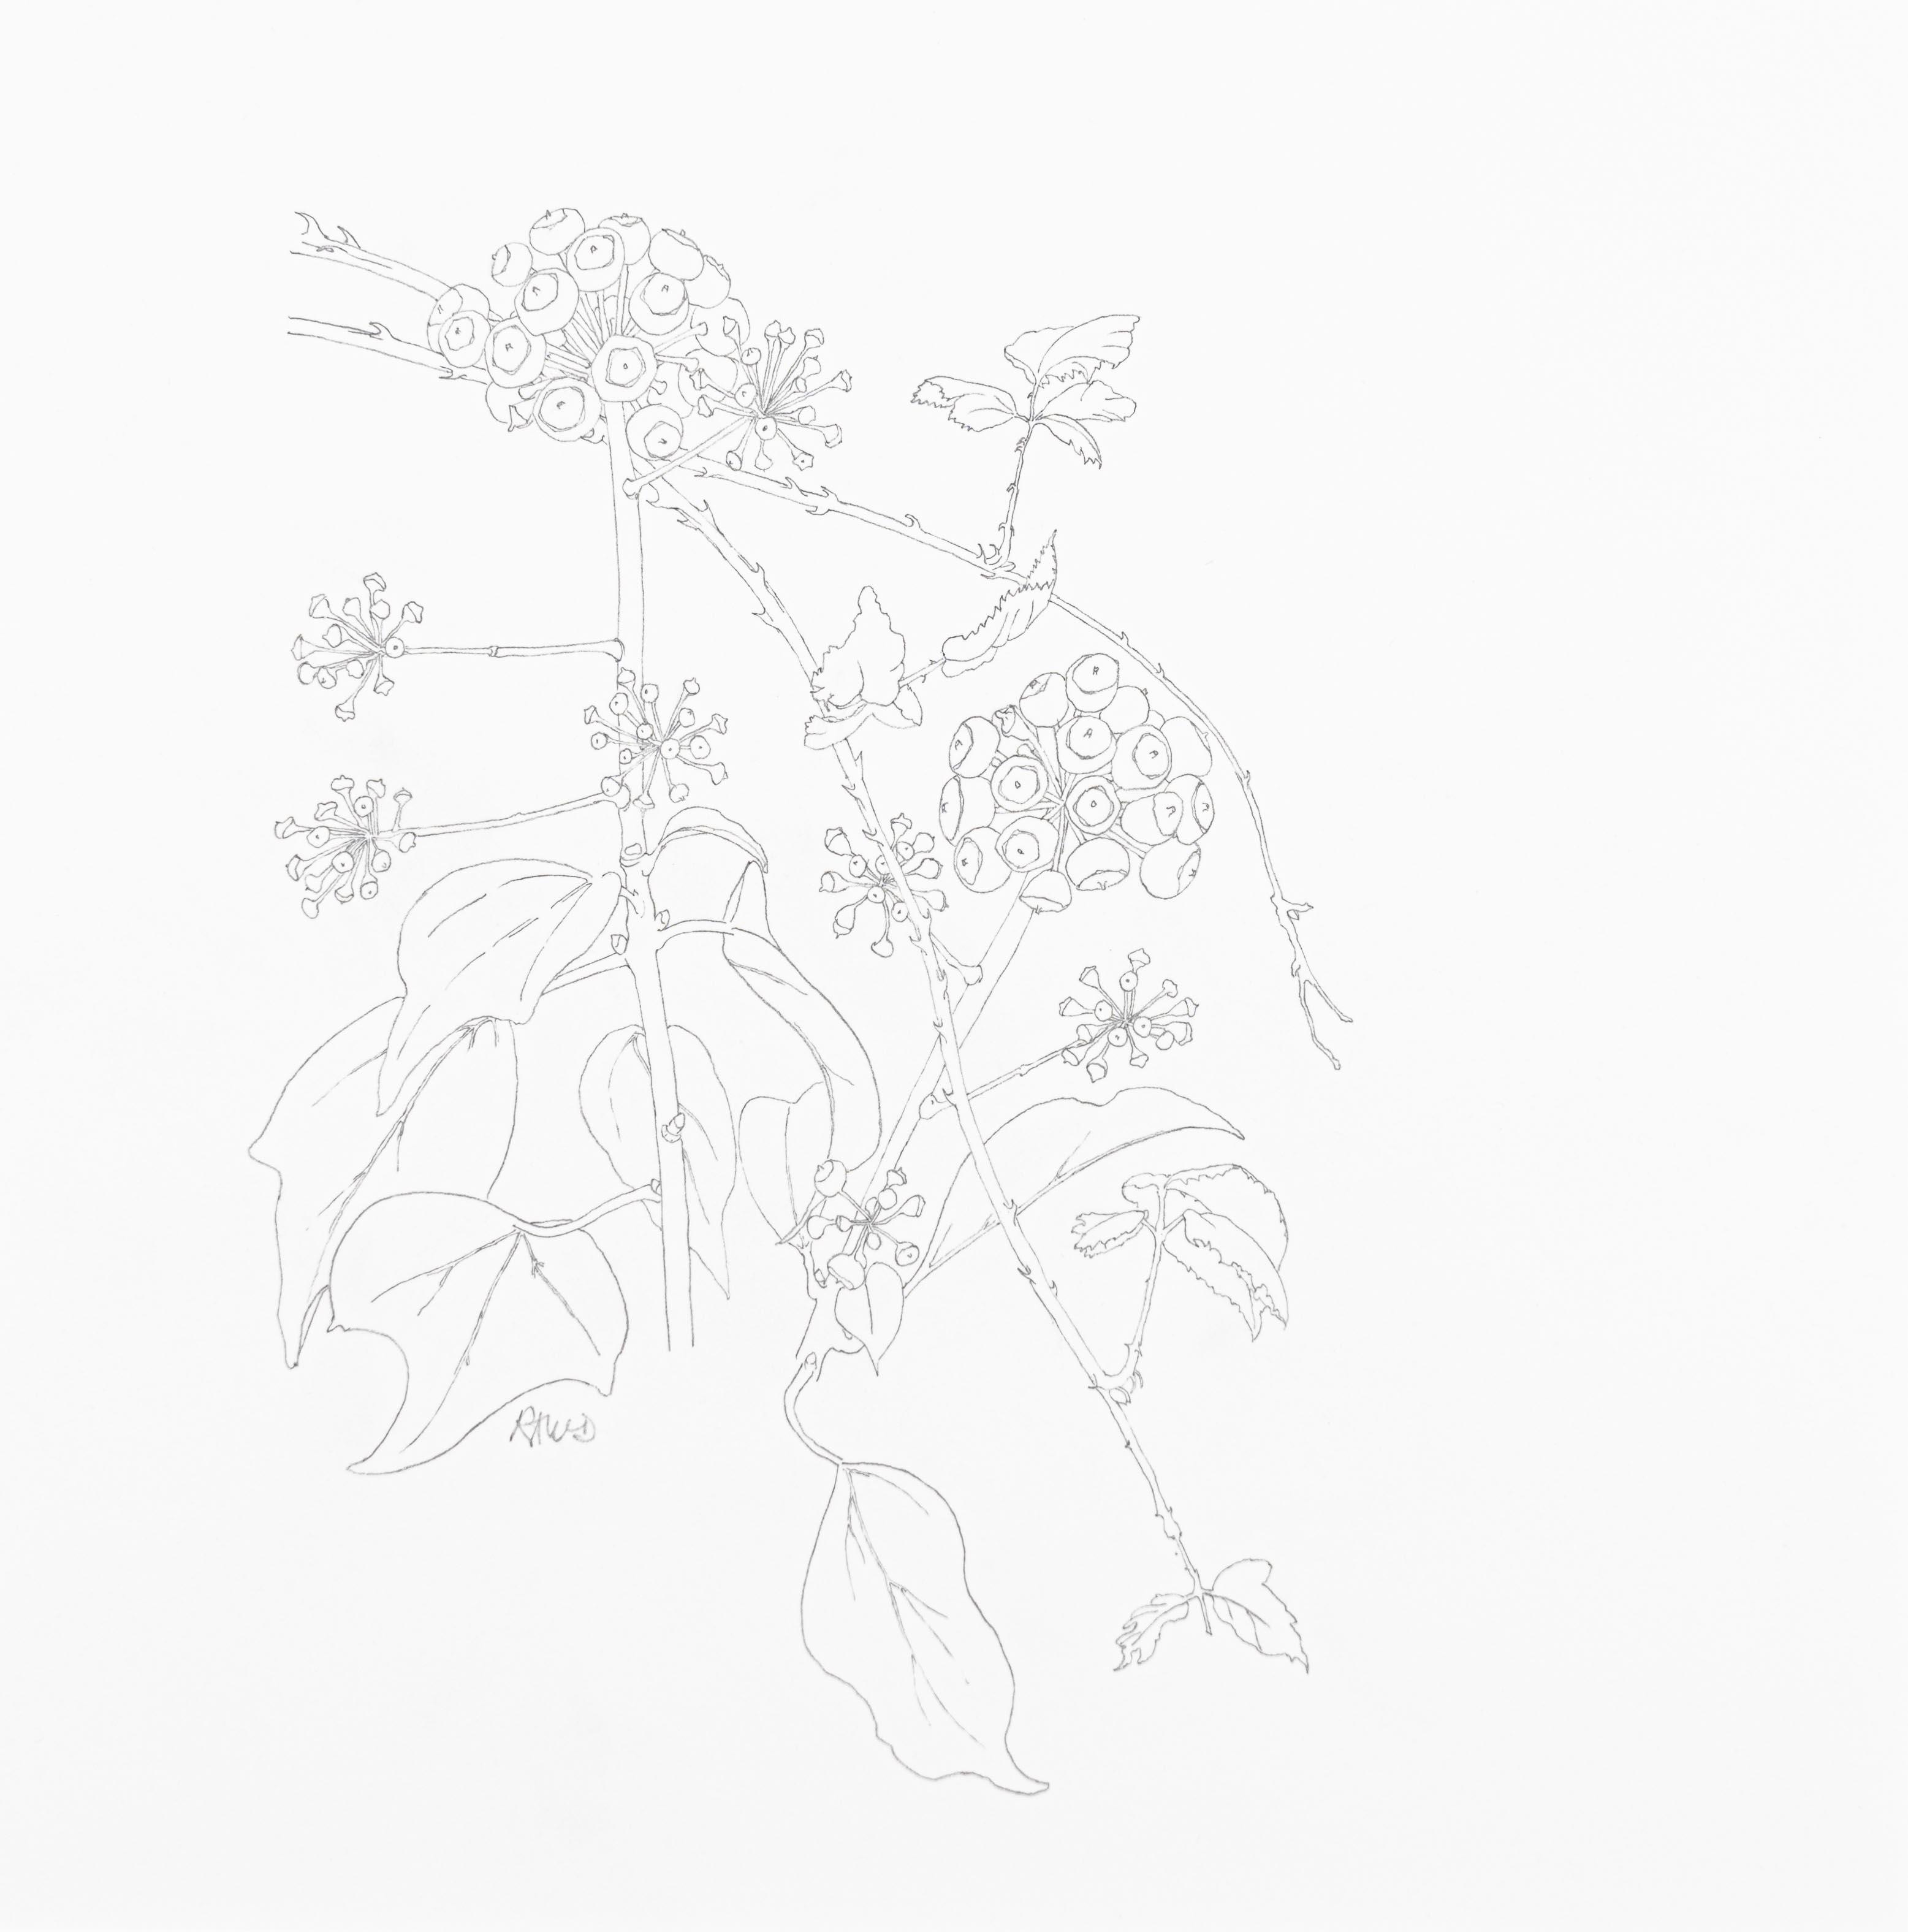 Hedera helix and Rubus fructicosus